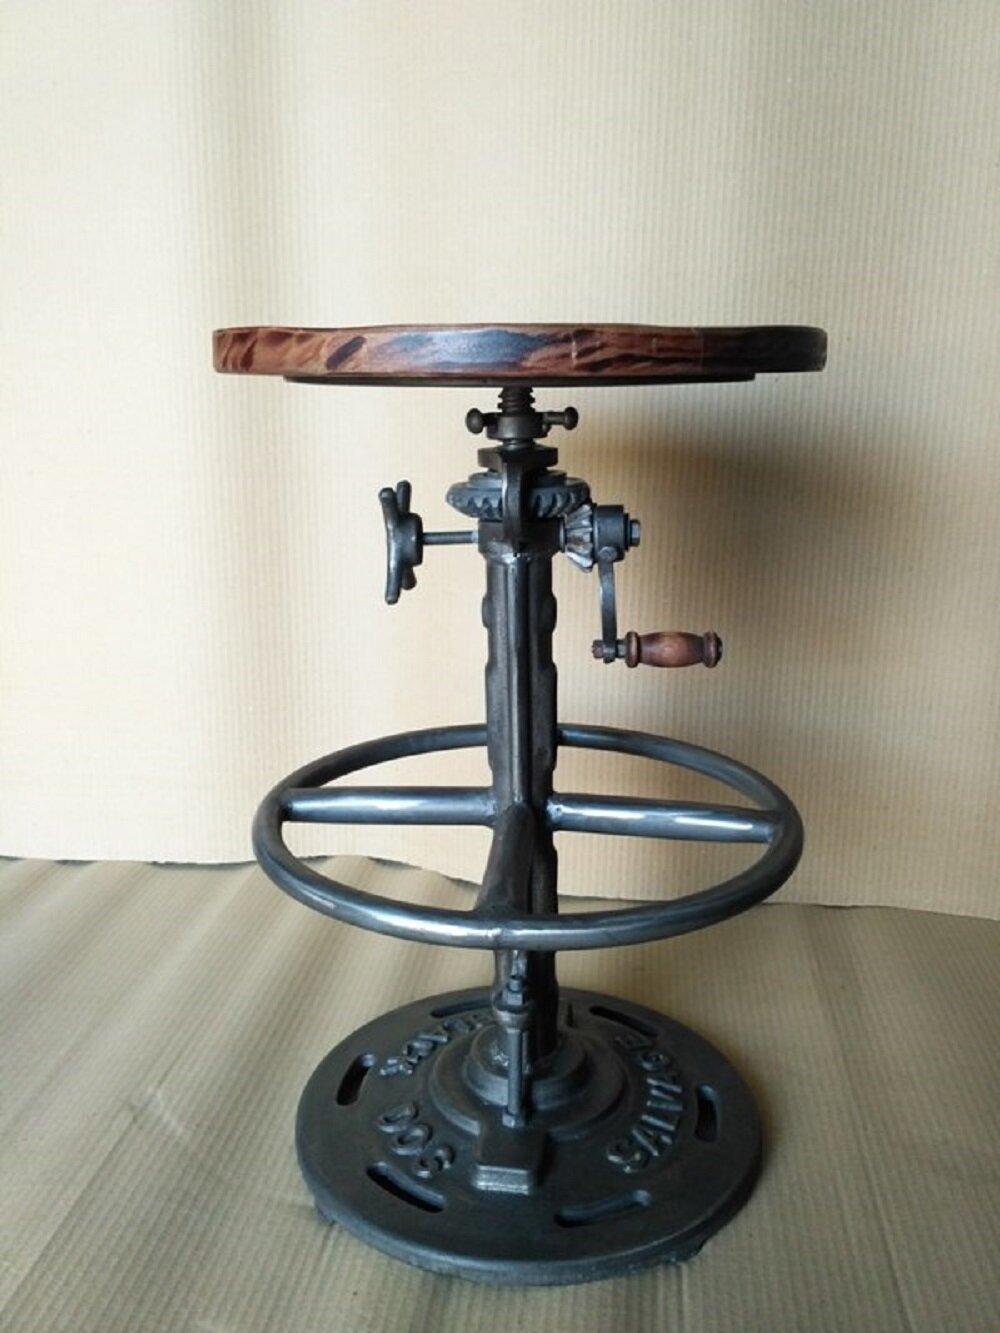 Remarkable Miranda Metal Adjustable Height Swivel Bar Stool Gamerscity Chair Design For Home Gamerscityorg